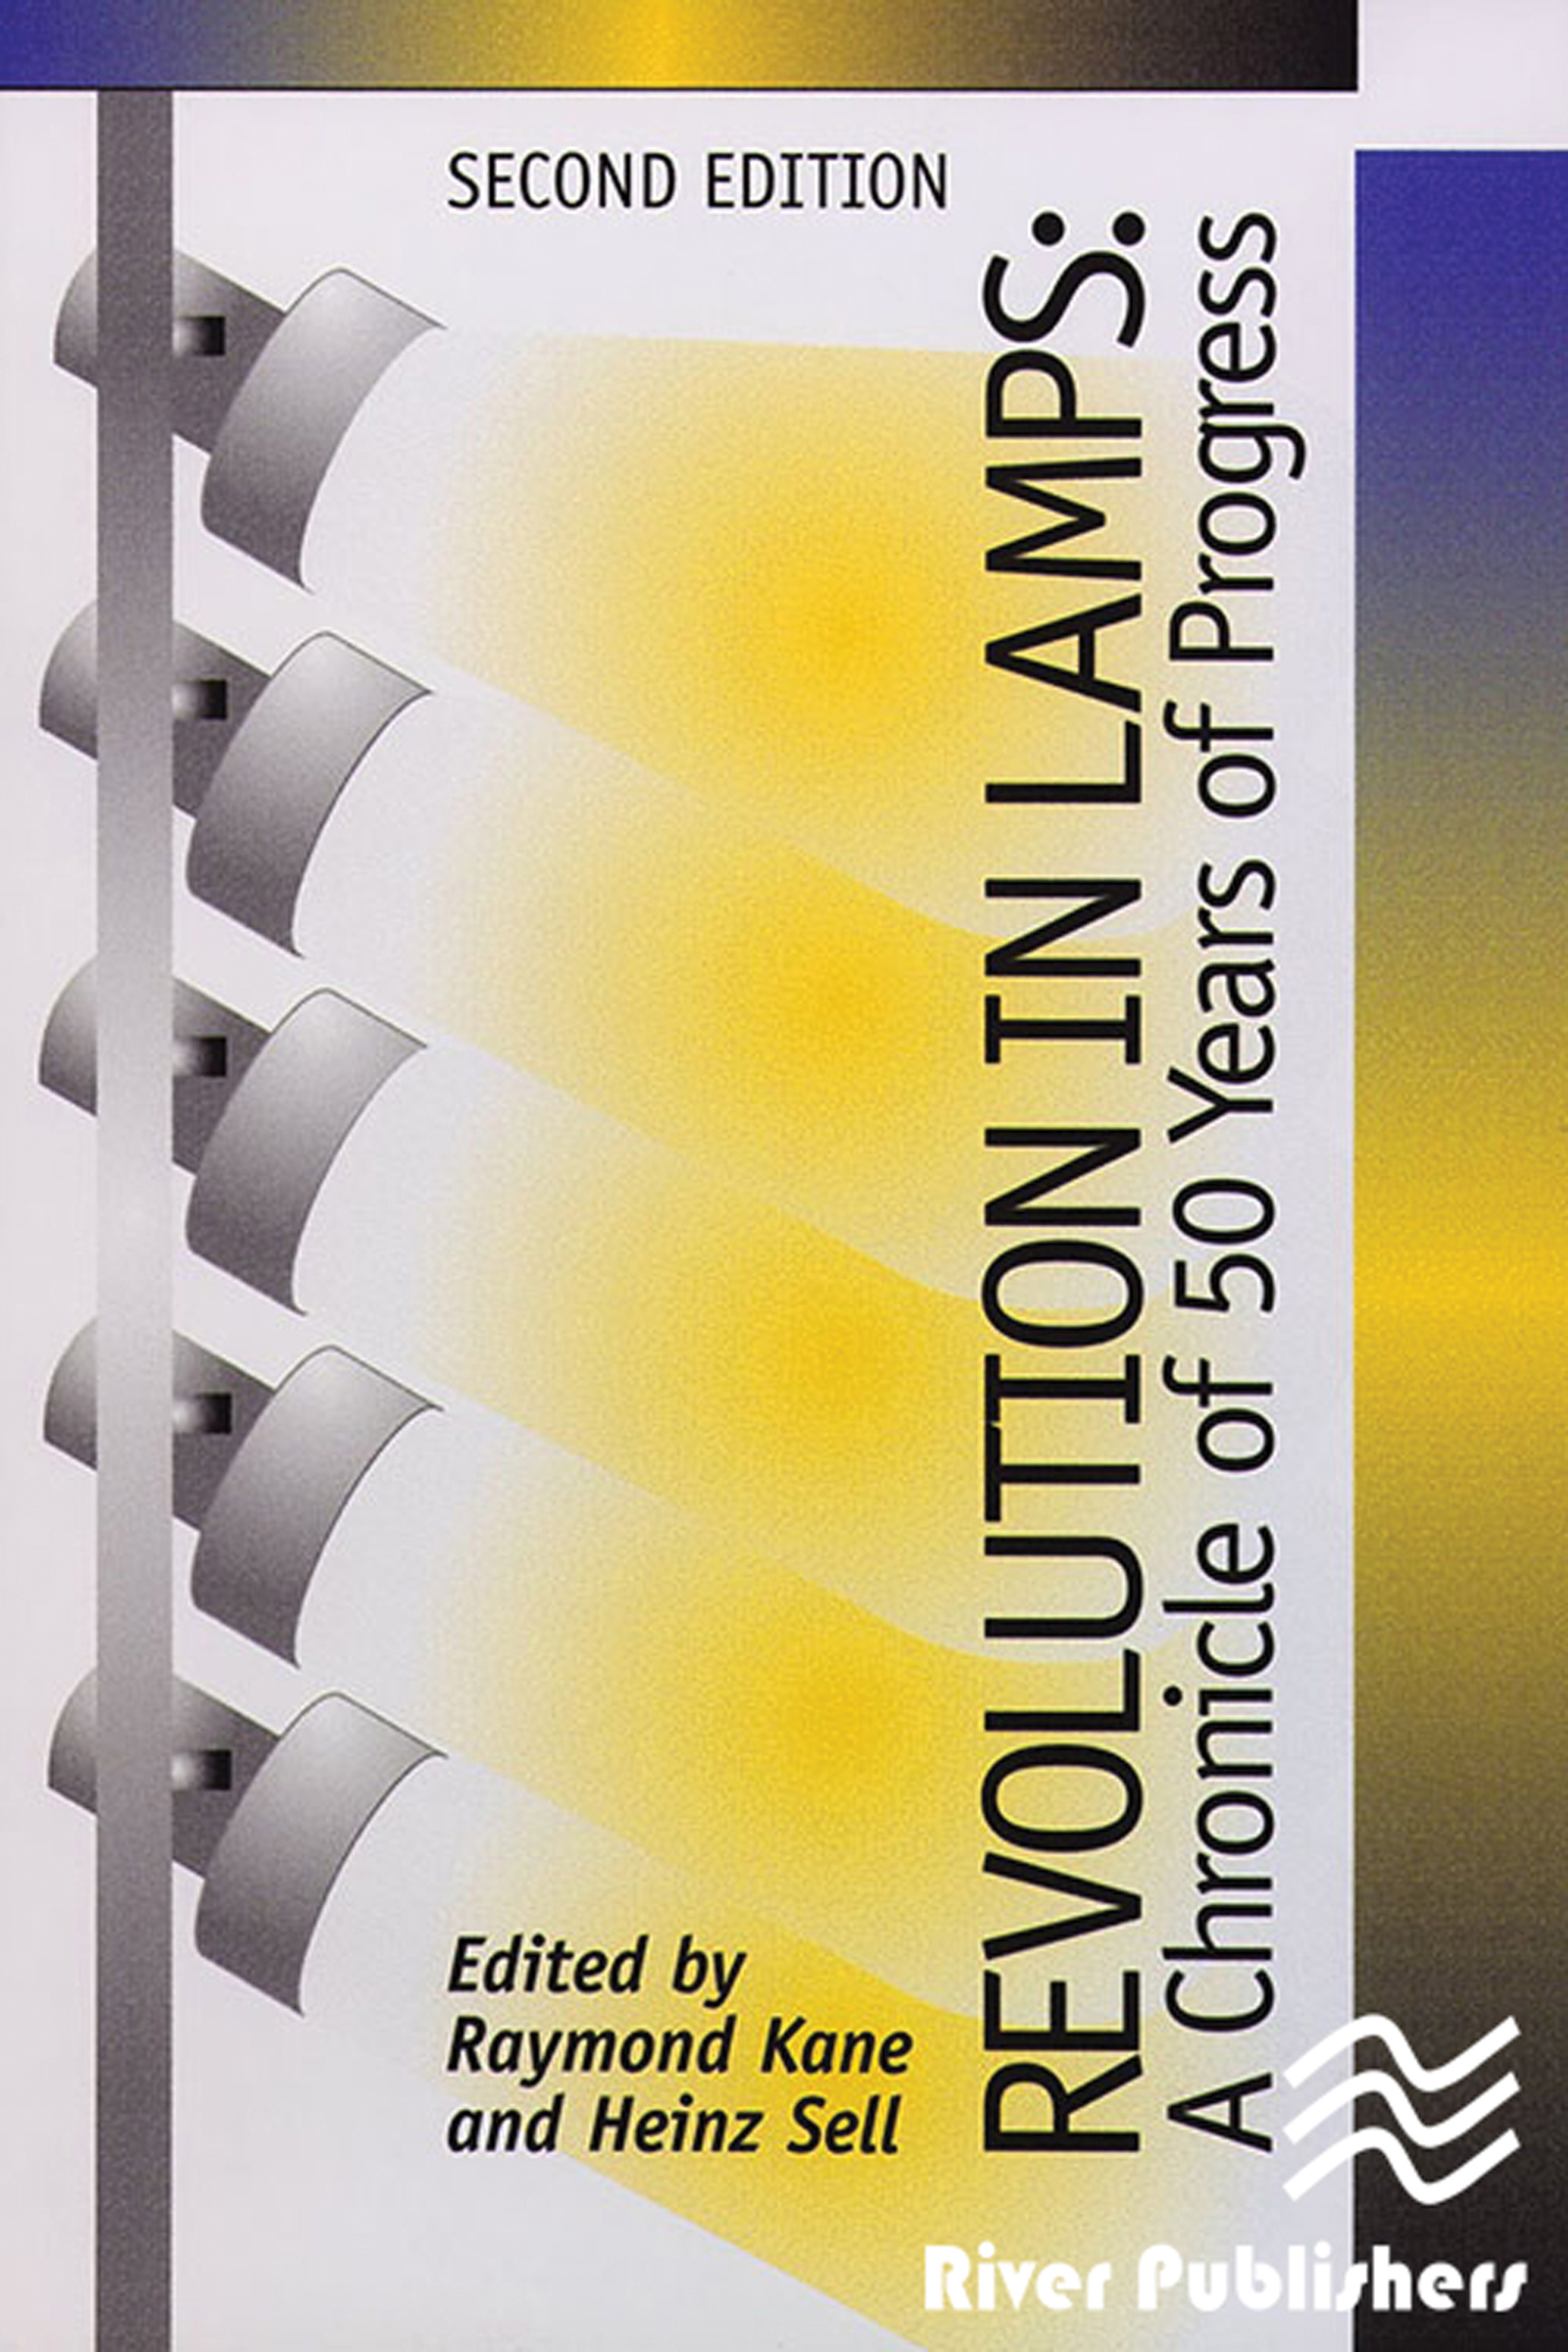 Revolution in Lamps